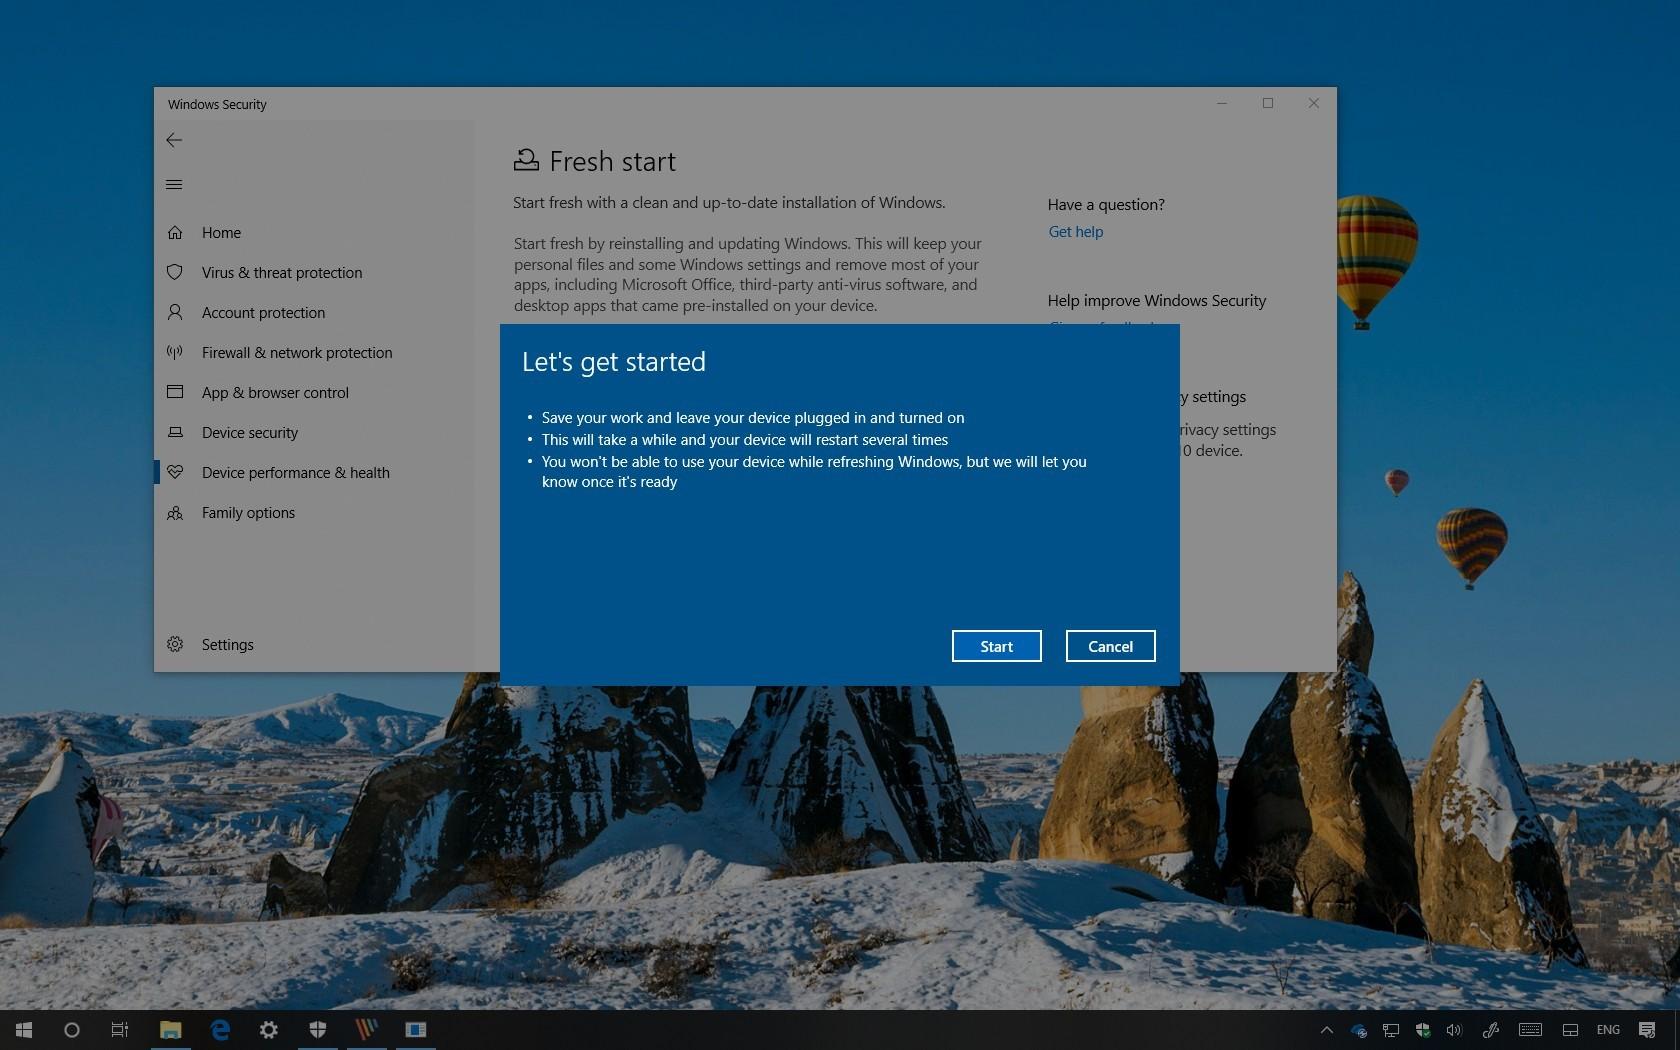 Windows 10 Fresh Start without bloatware